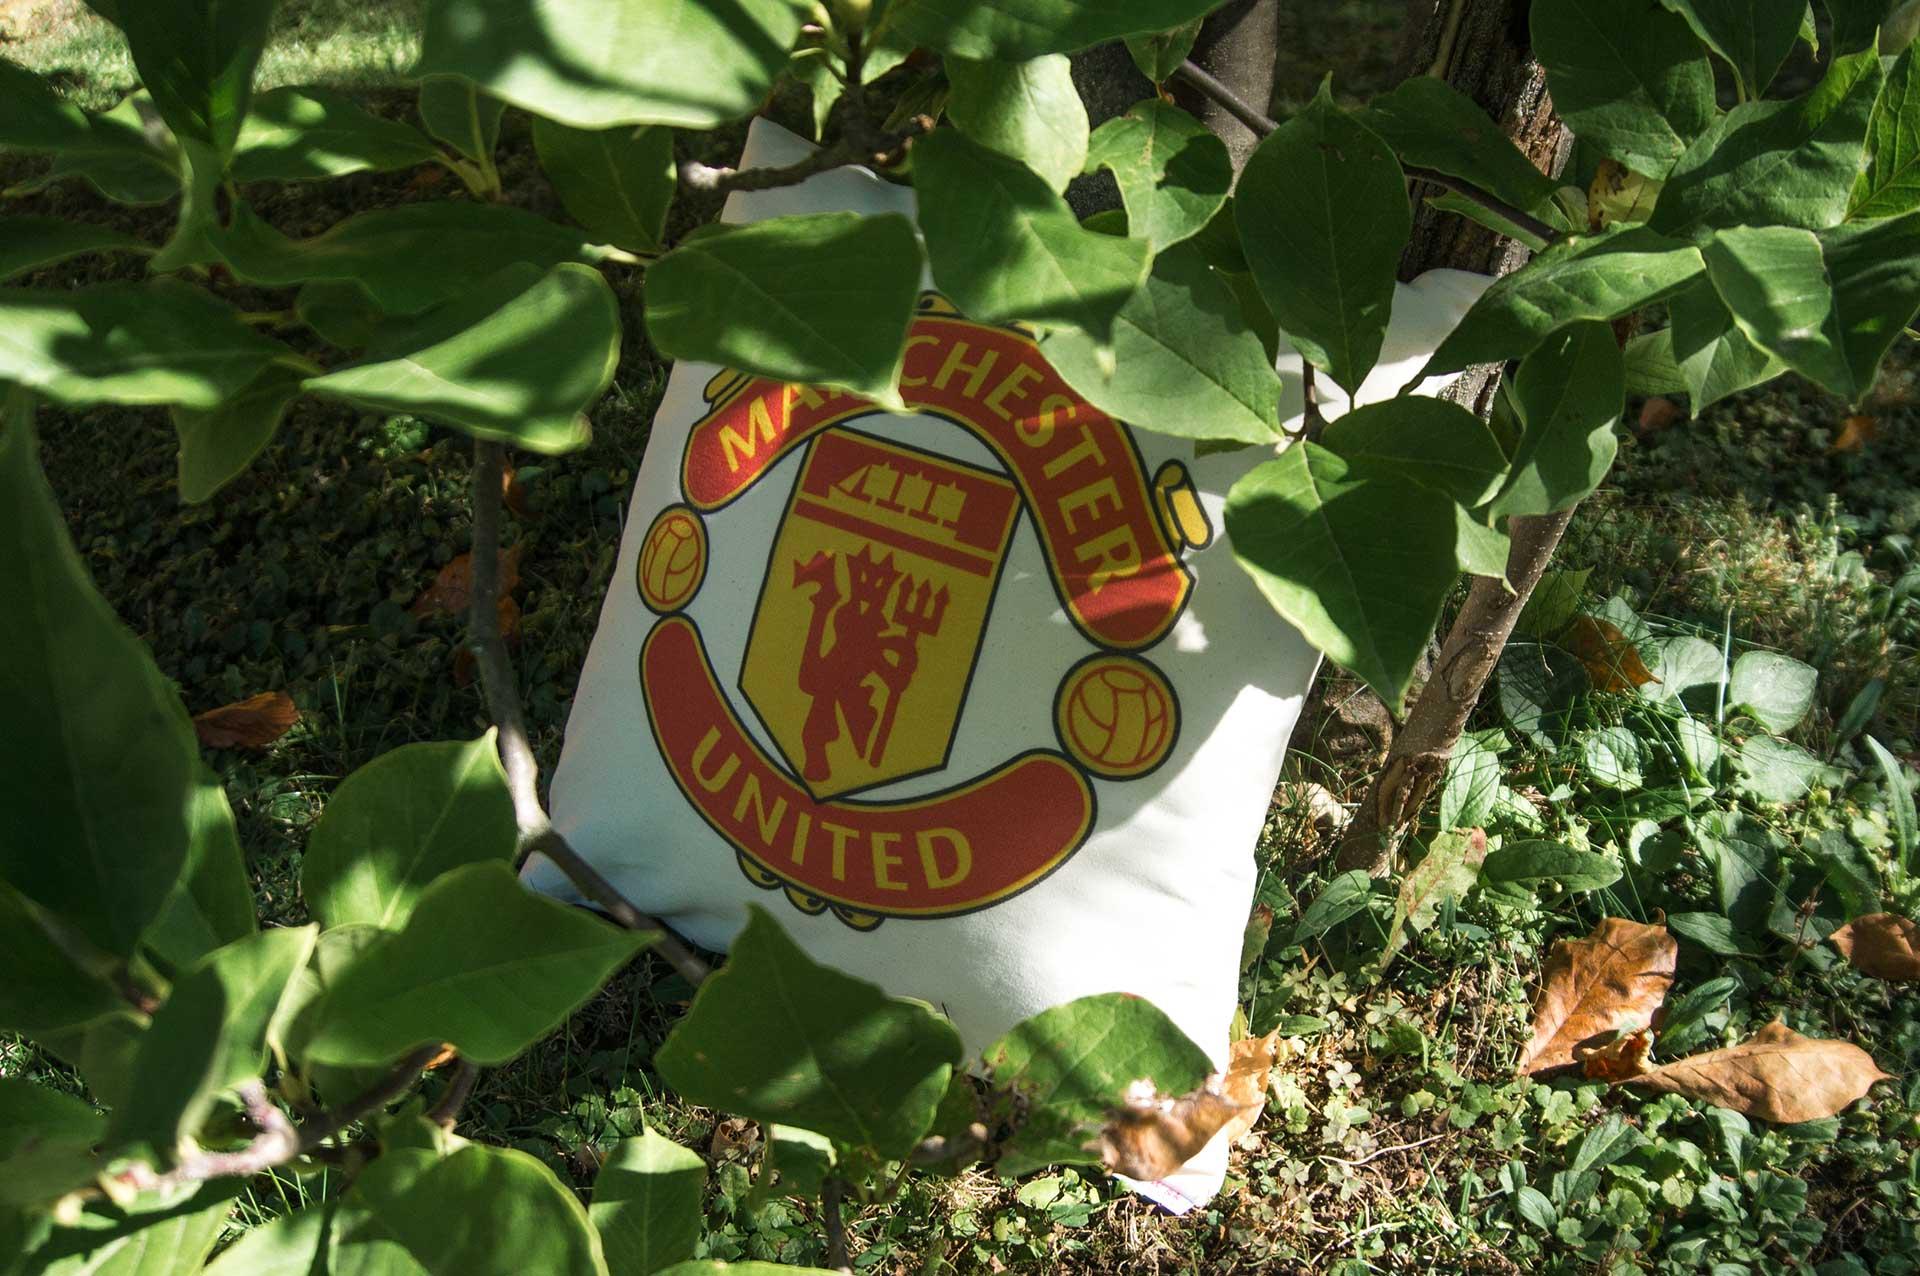 Vankúšik s logom futbalového klubu Manchester United